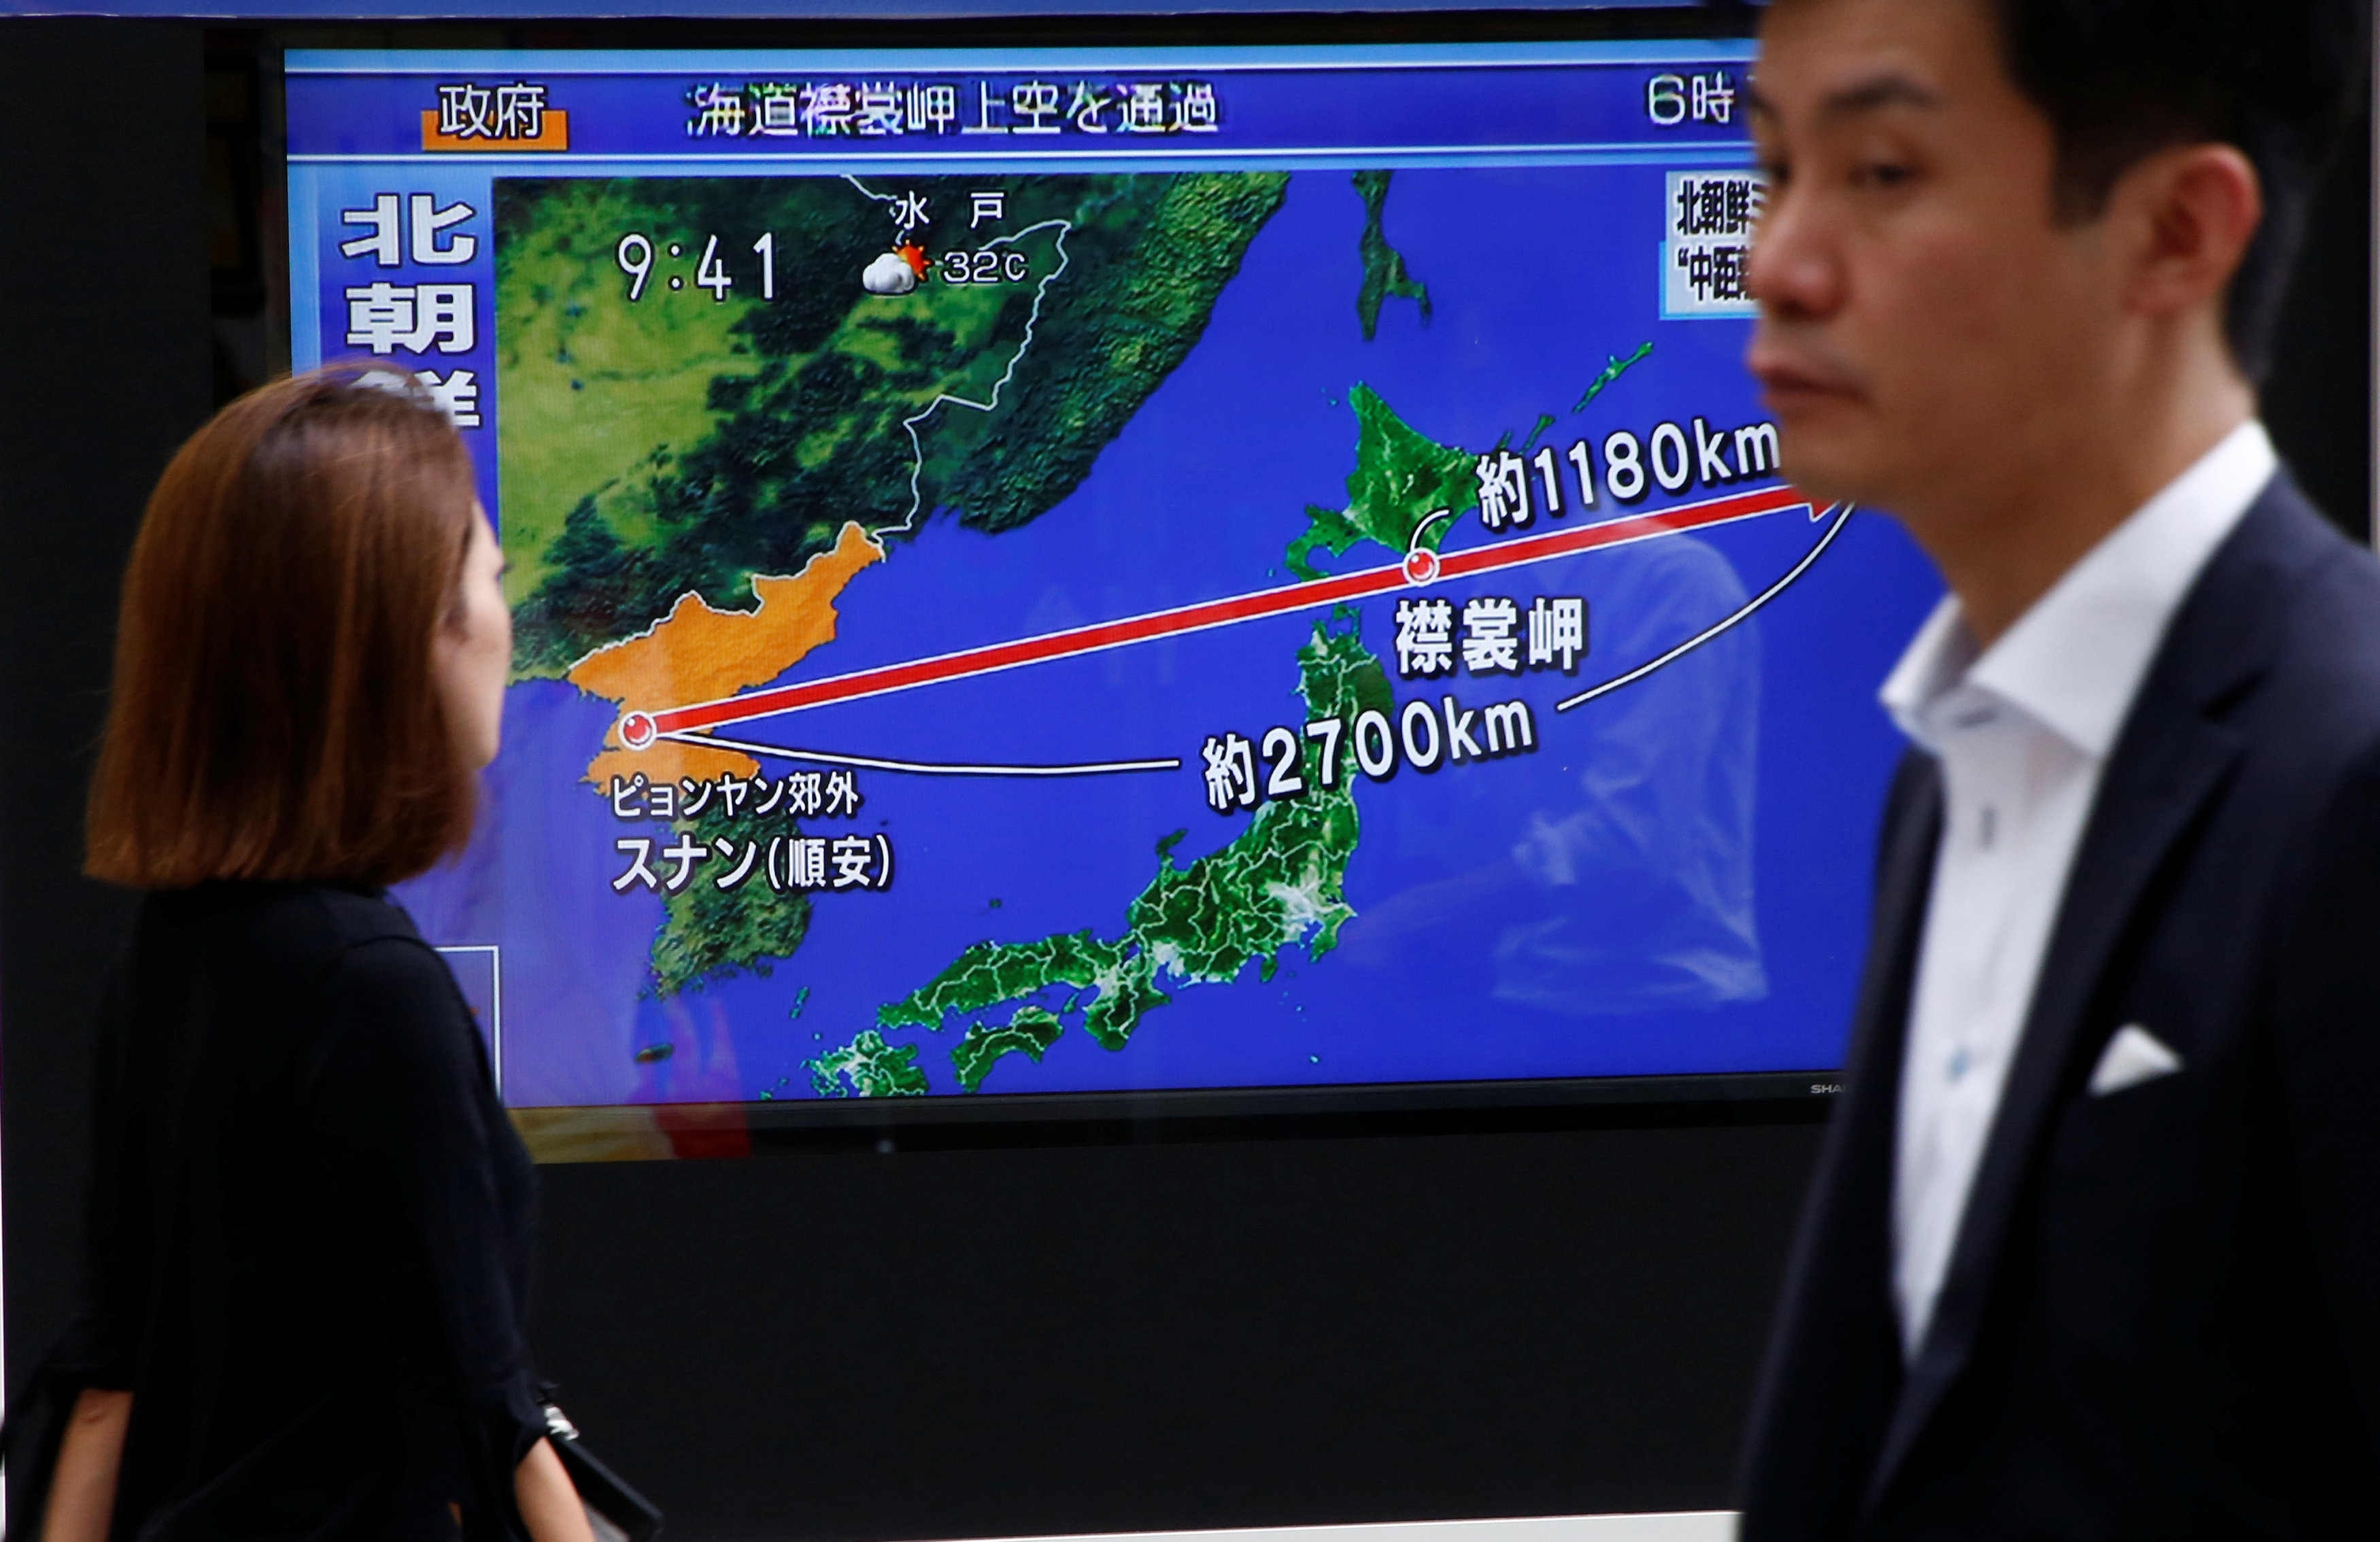 2017 08 29T010128Z 1762625195 RC1F6D04C3B0 RTRMADP 3 NORTHKOREA MISSILES JAPAN